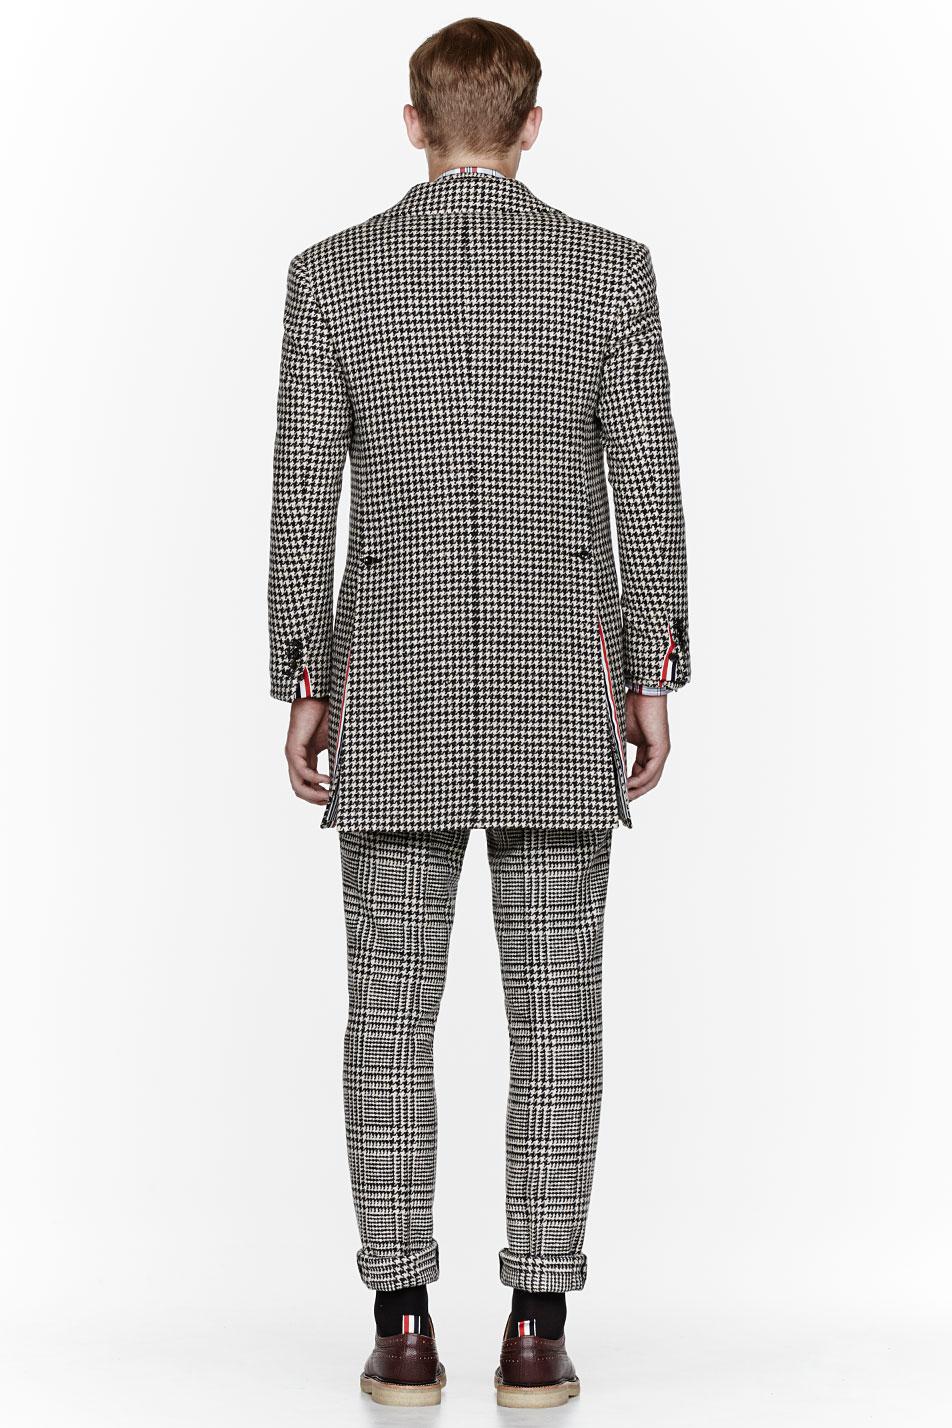 Glen Plaid Suit x Herringbone Coat Thom Browne 3